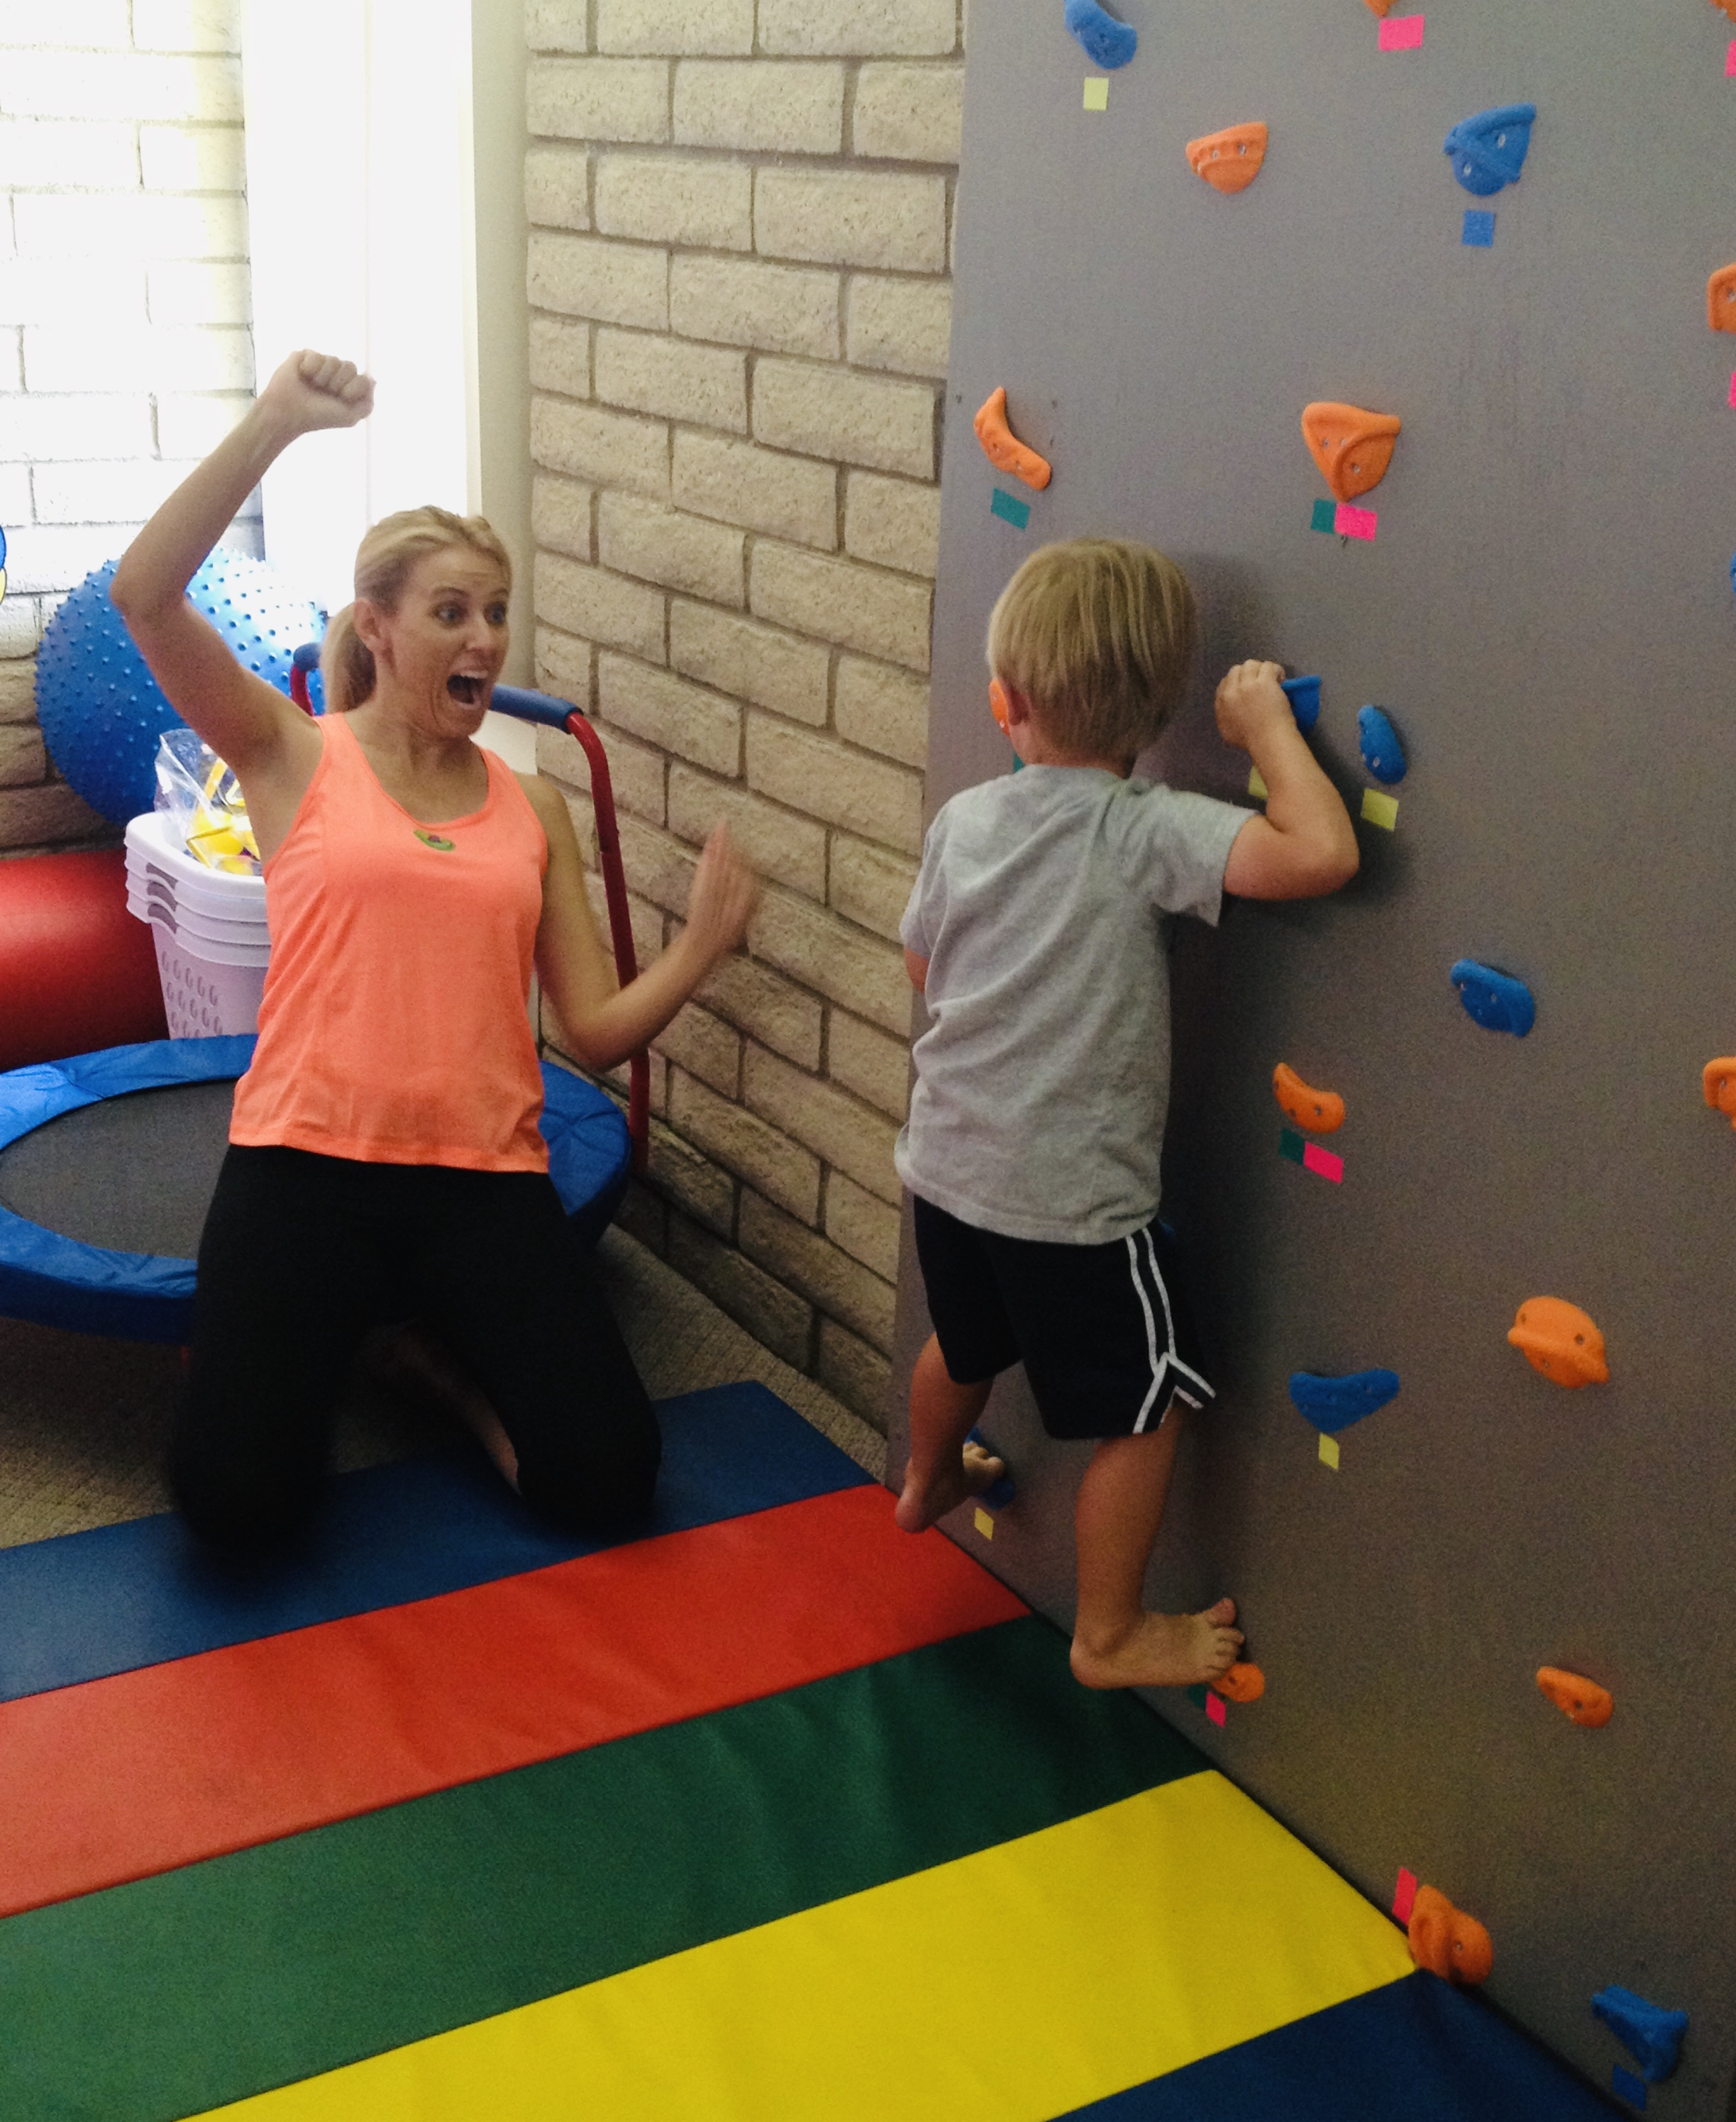 Woman encouraging little boy on rock climbing wall